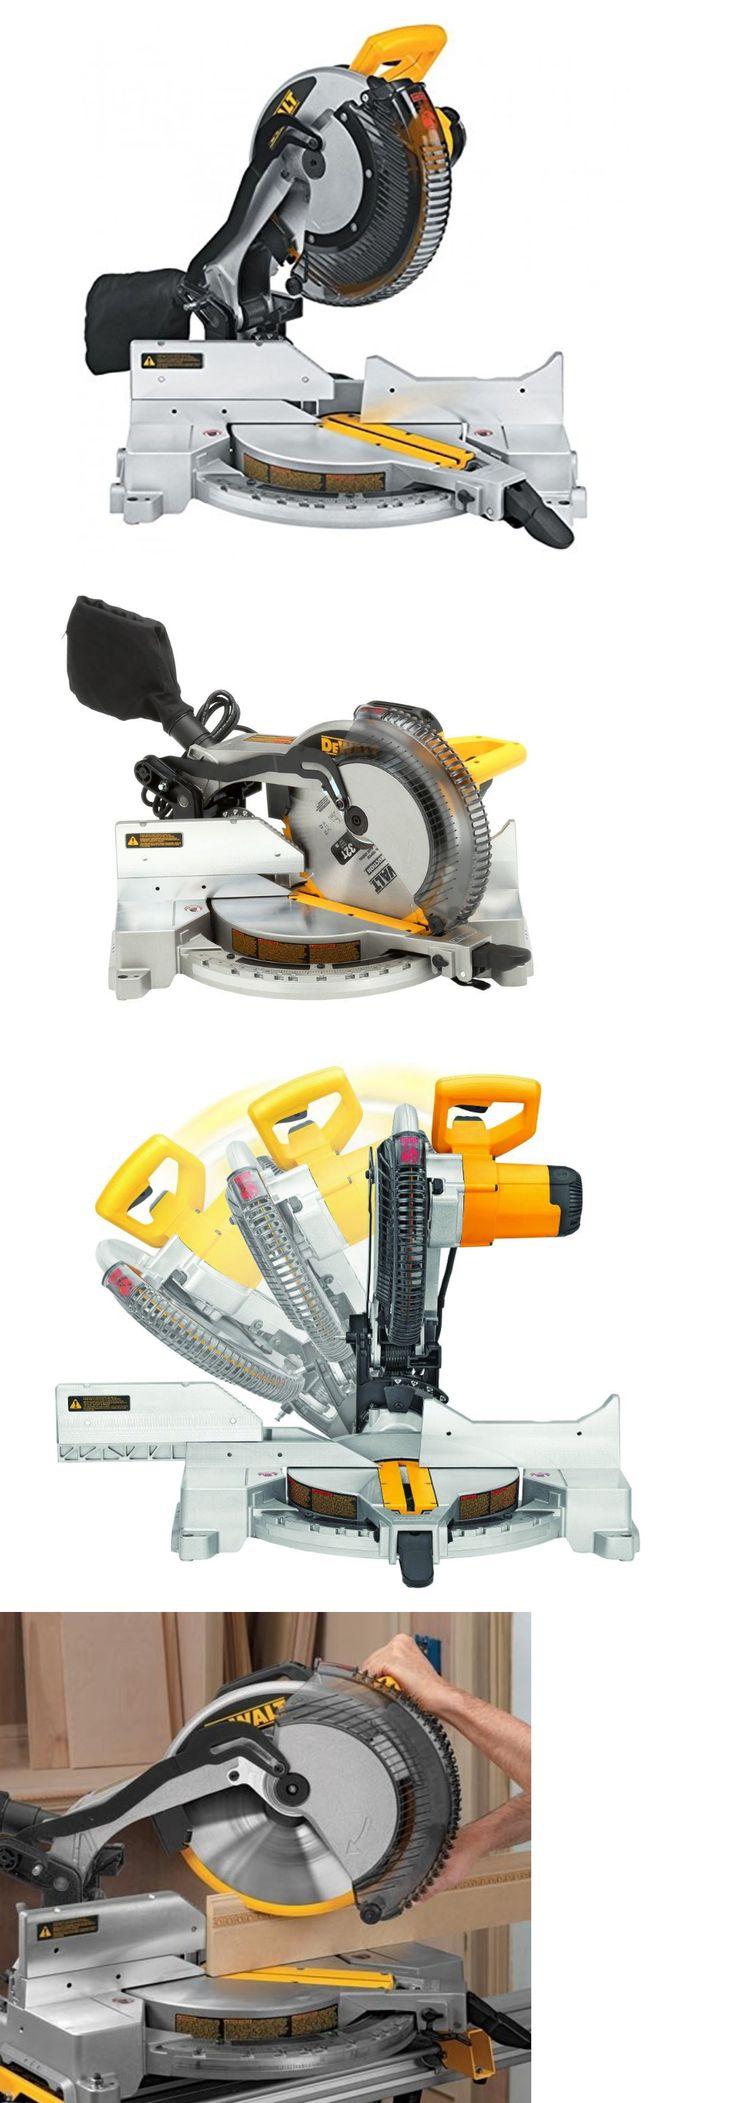 Miter and Chop Saws 20787: Dewalt - Single-Bevel Compound Miter Saw 15-Amp 12-Inch (Dw715) -> BUY IT NOW ONLY: $309 on eBay!